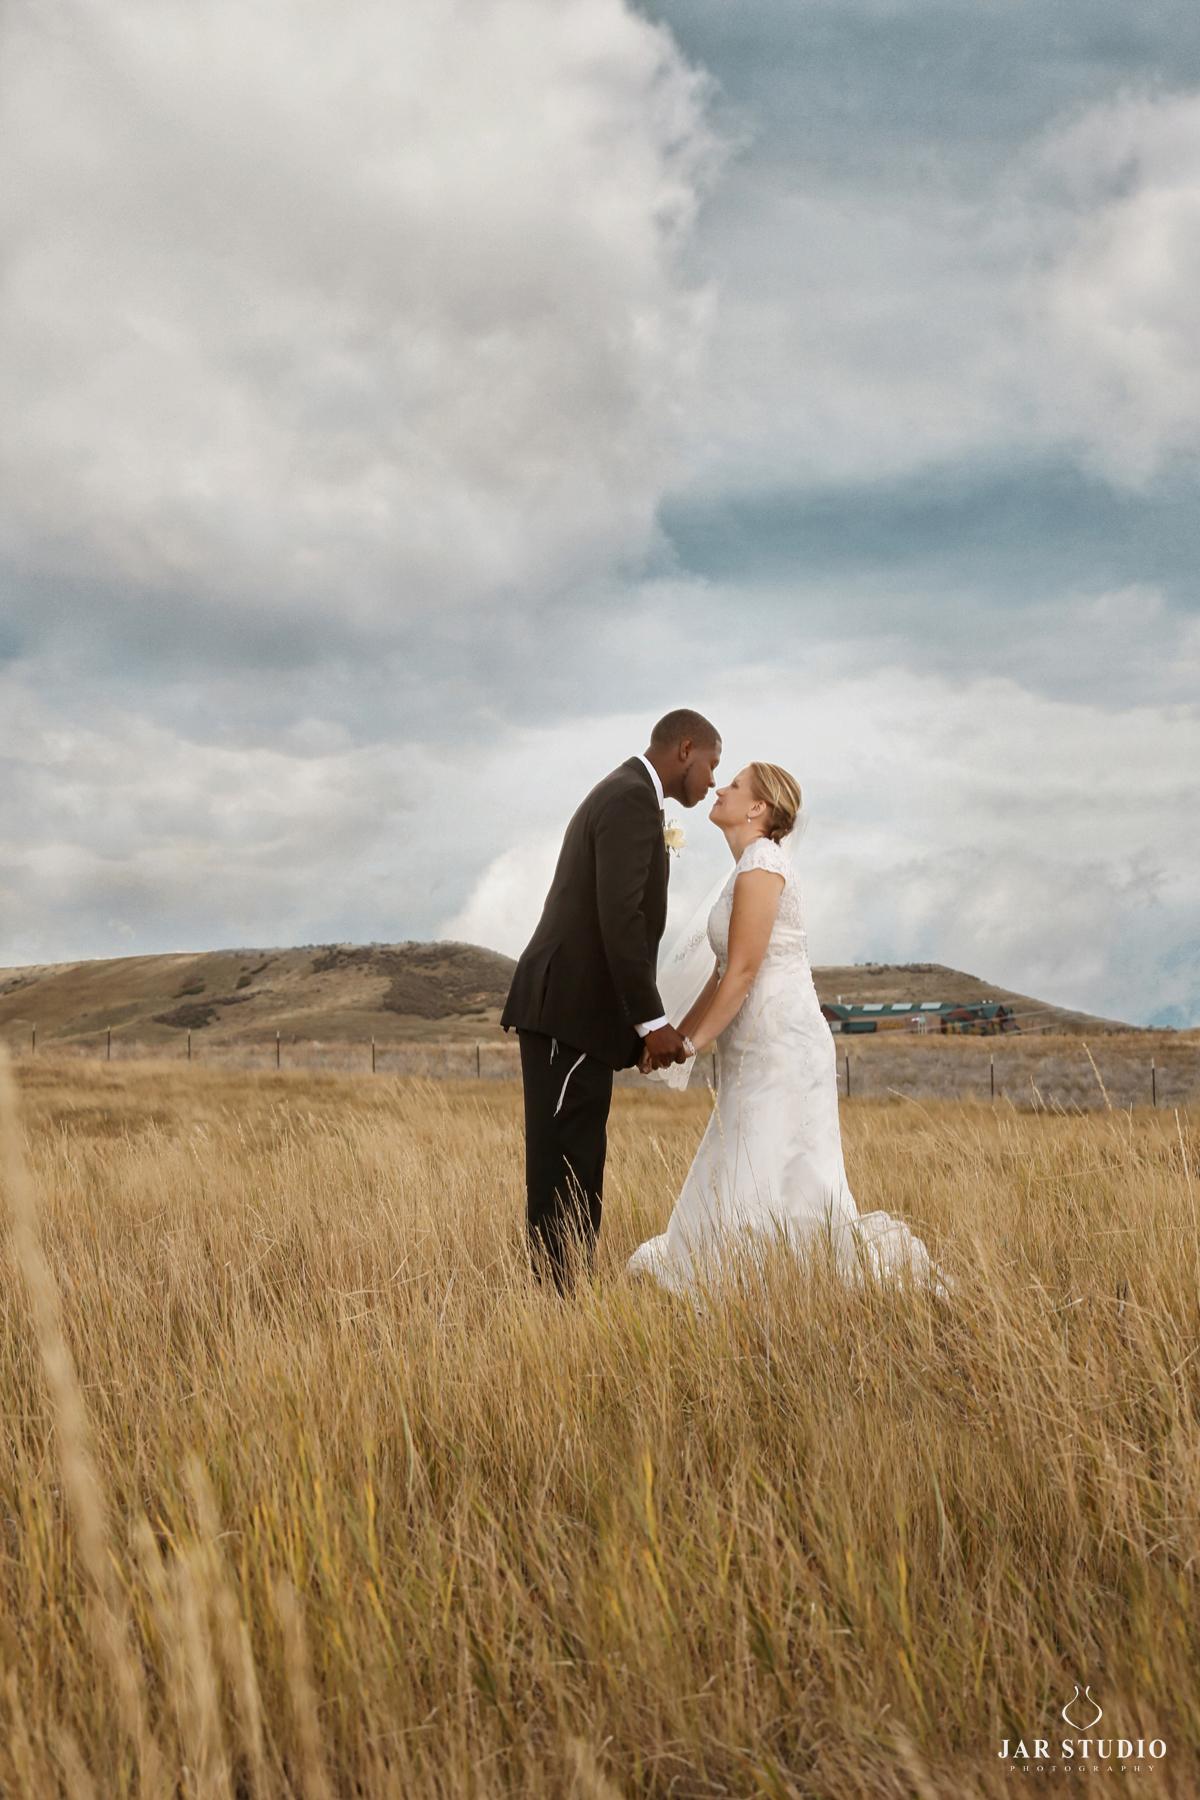 24-best-location-florida-wedding-portrait-photography-jarstudio.jpg